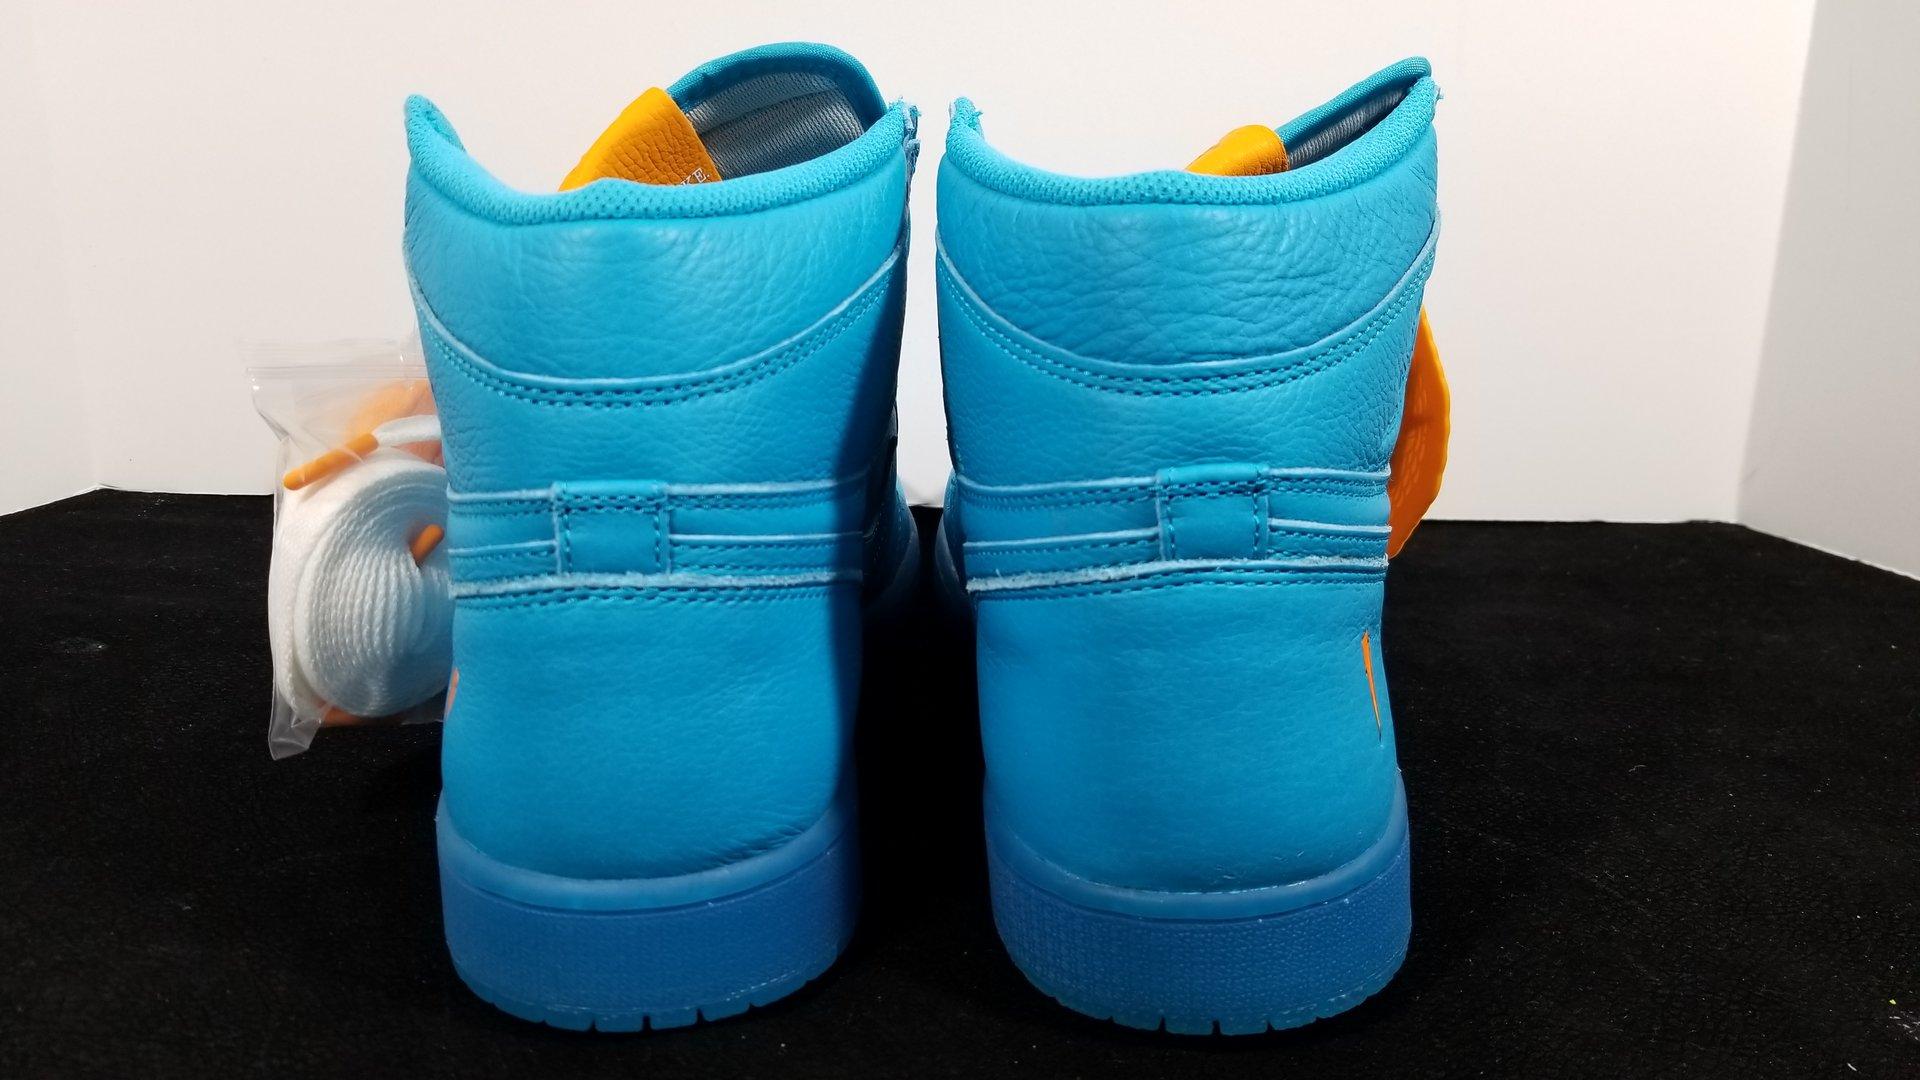 List Lagoon On Must 1 Gatorade Blue Your The Air Is Jordan Cop c53jLRq4AS